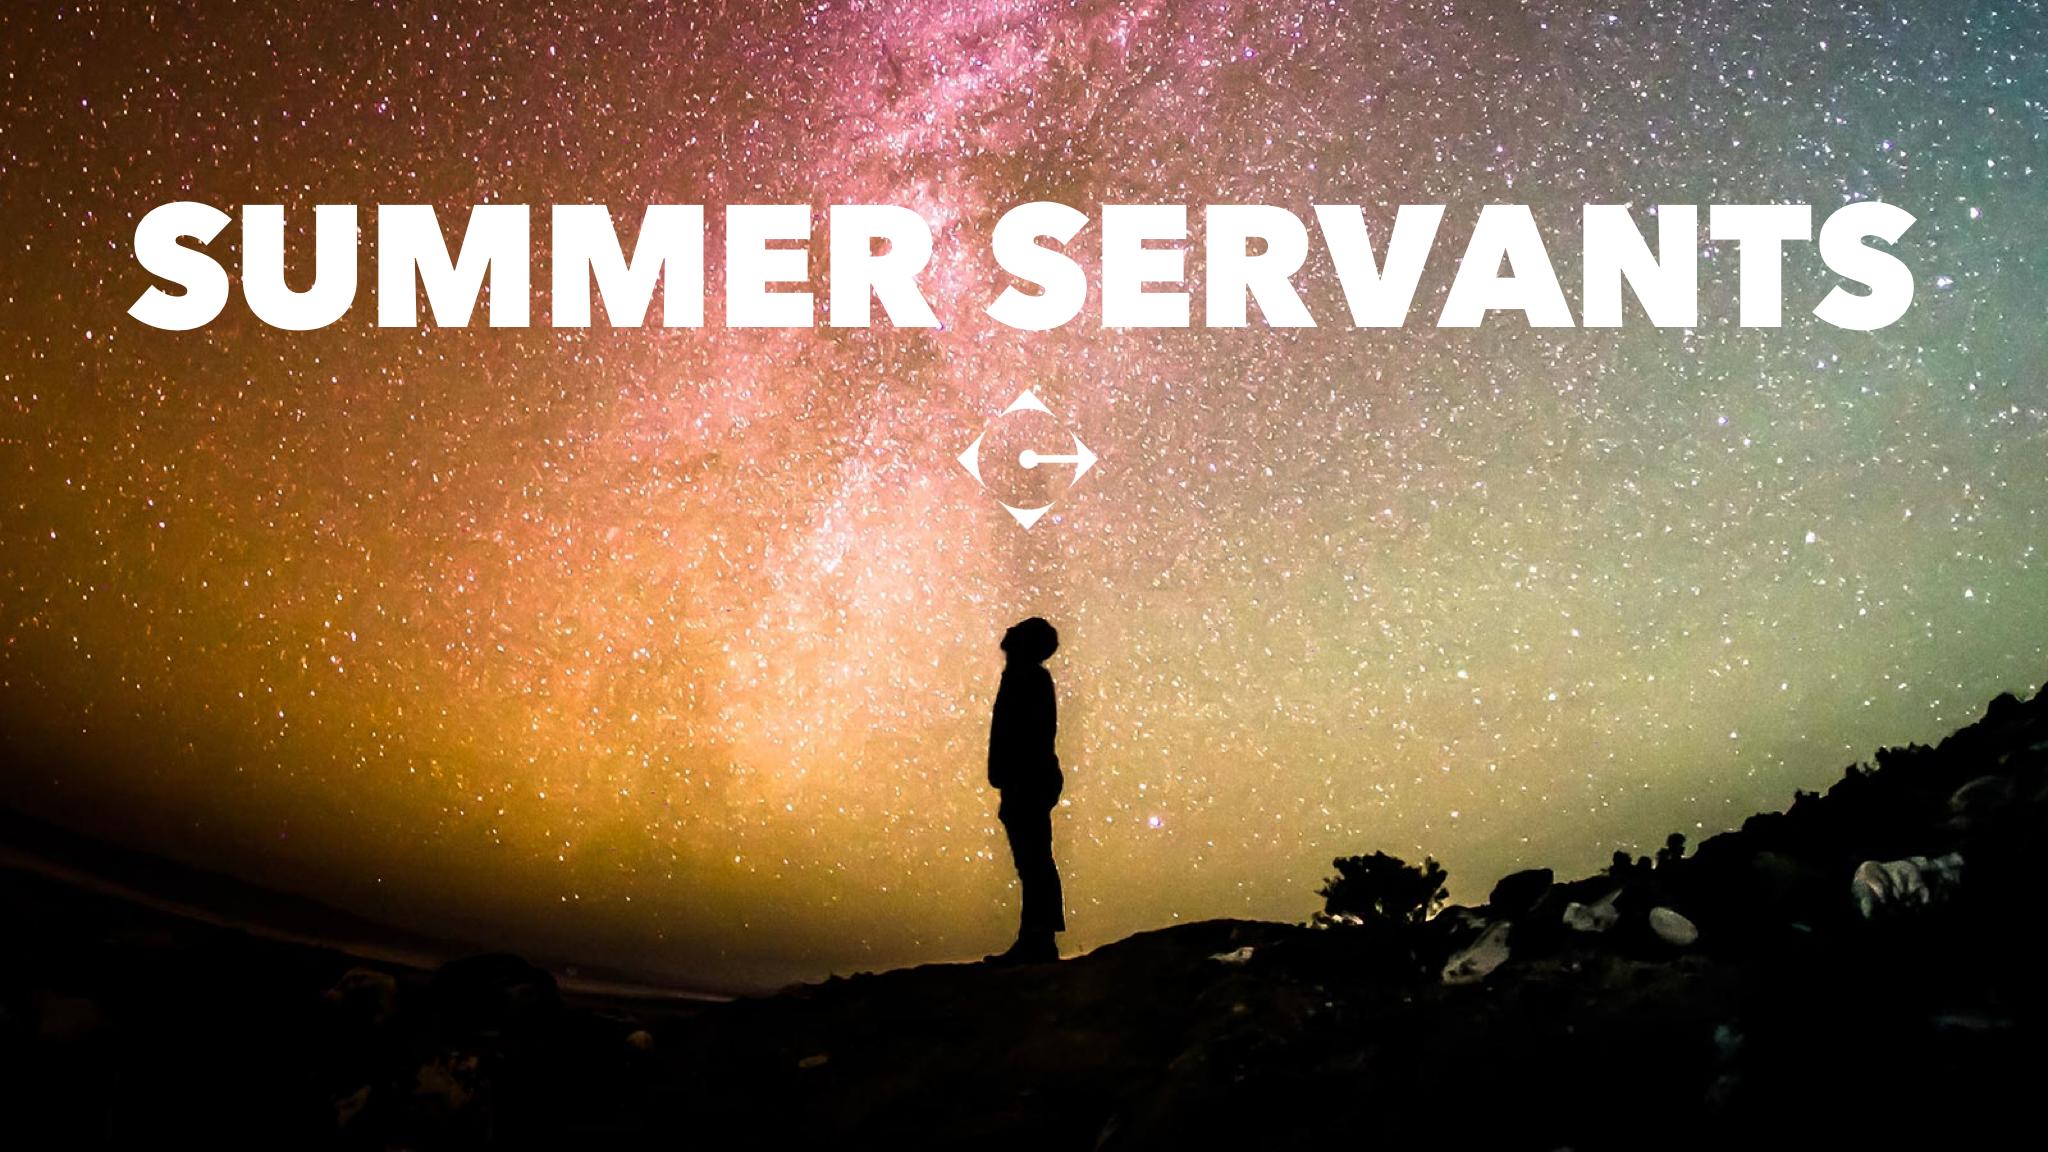 SummerServantsLogo